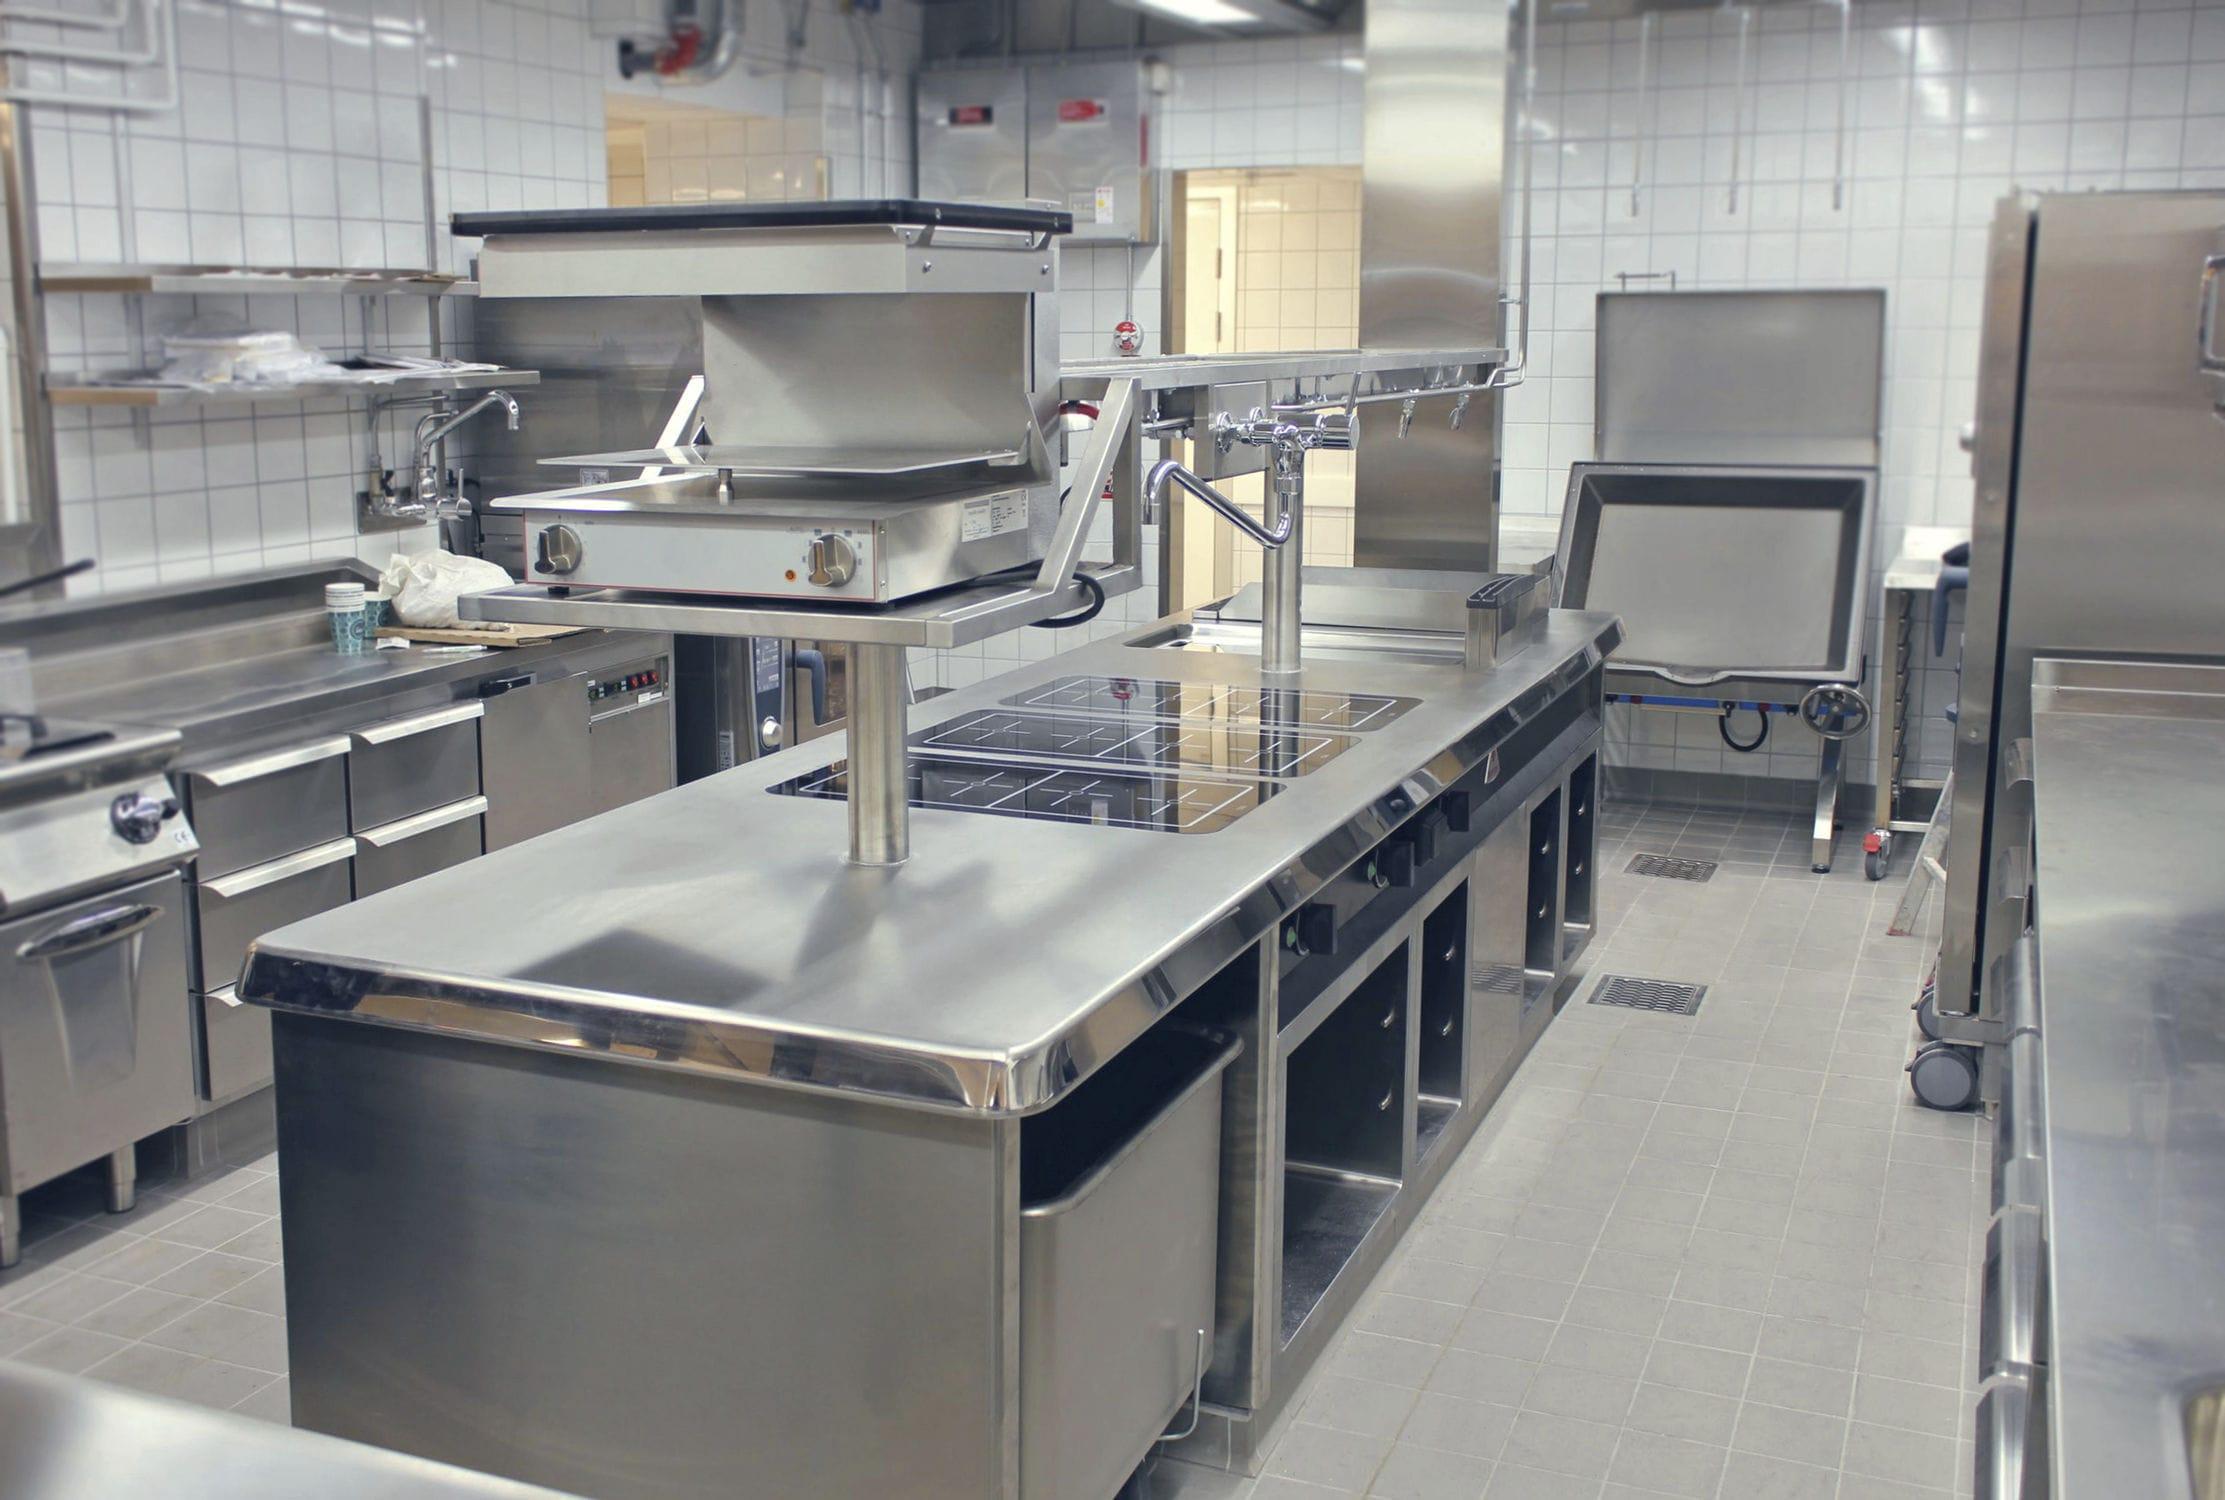 Cucina moderna / in acciaio inox / modulare / professionale ...